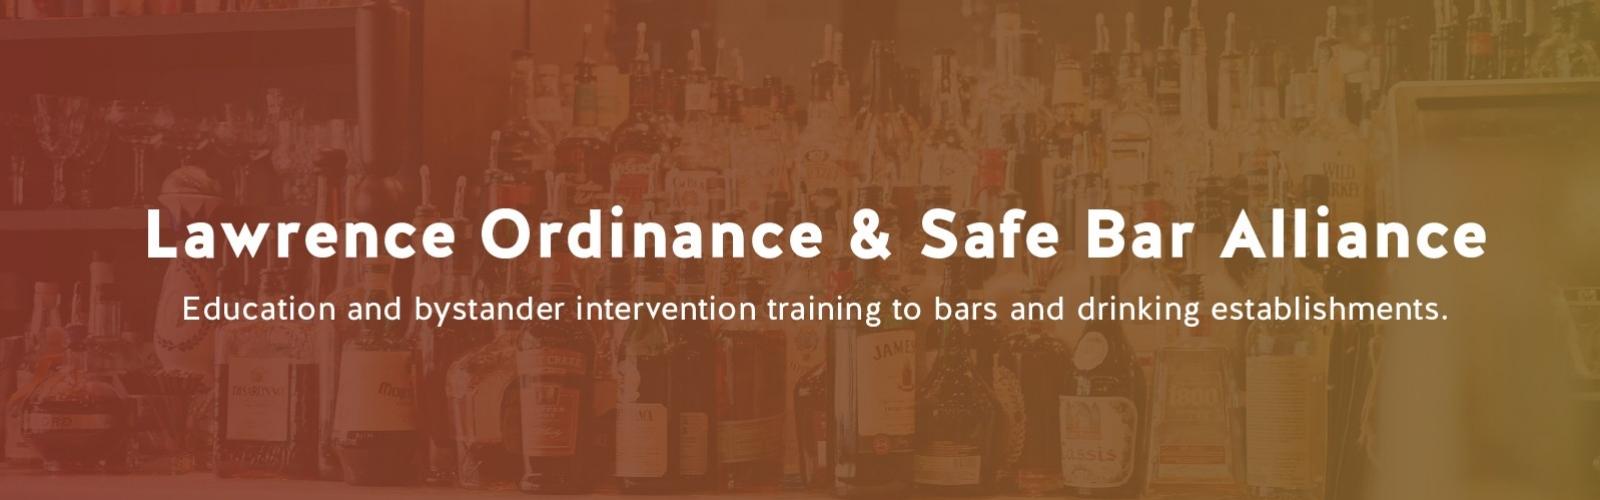 Lawrence Ordinance & Safe Bar Alliance